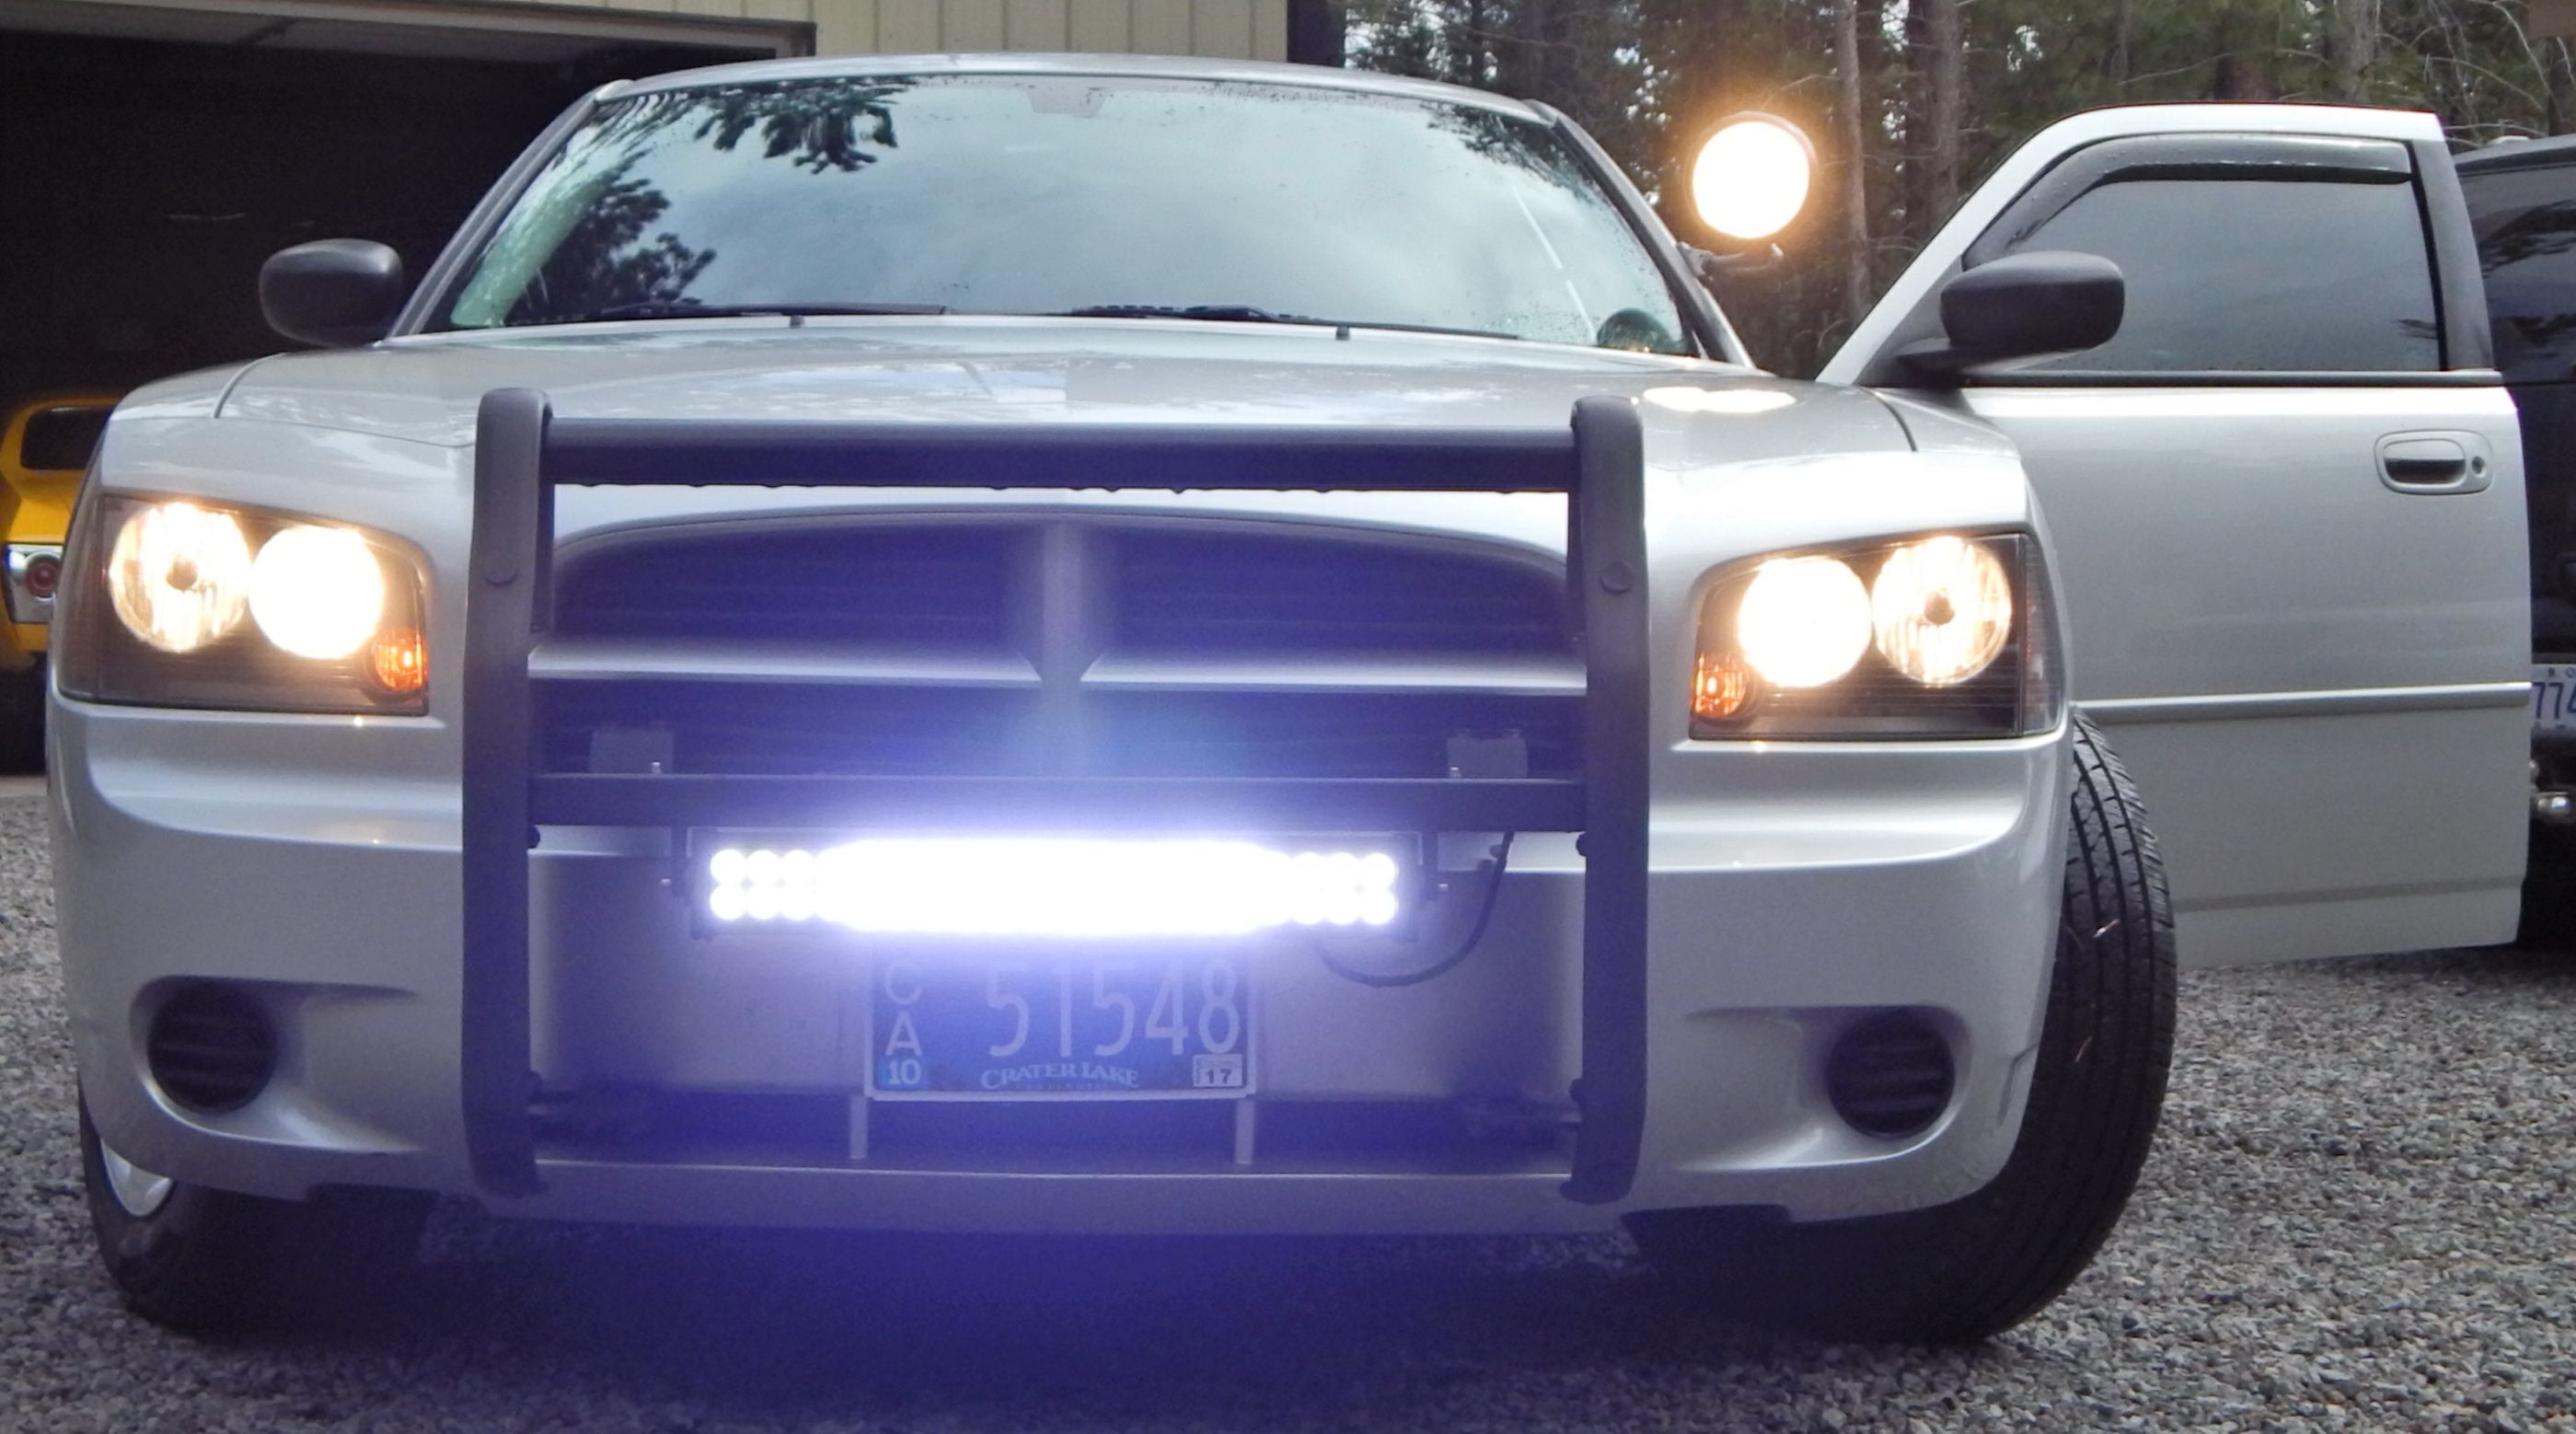 2009 Dodge Charger 82k Miles Dodge Charger Dodge Police Cars